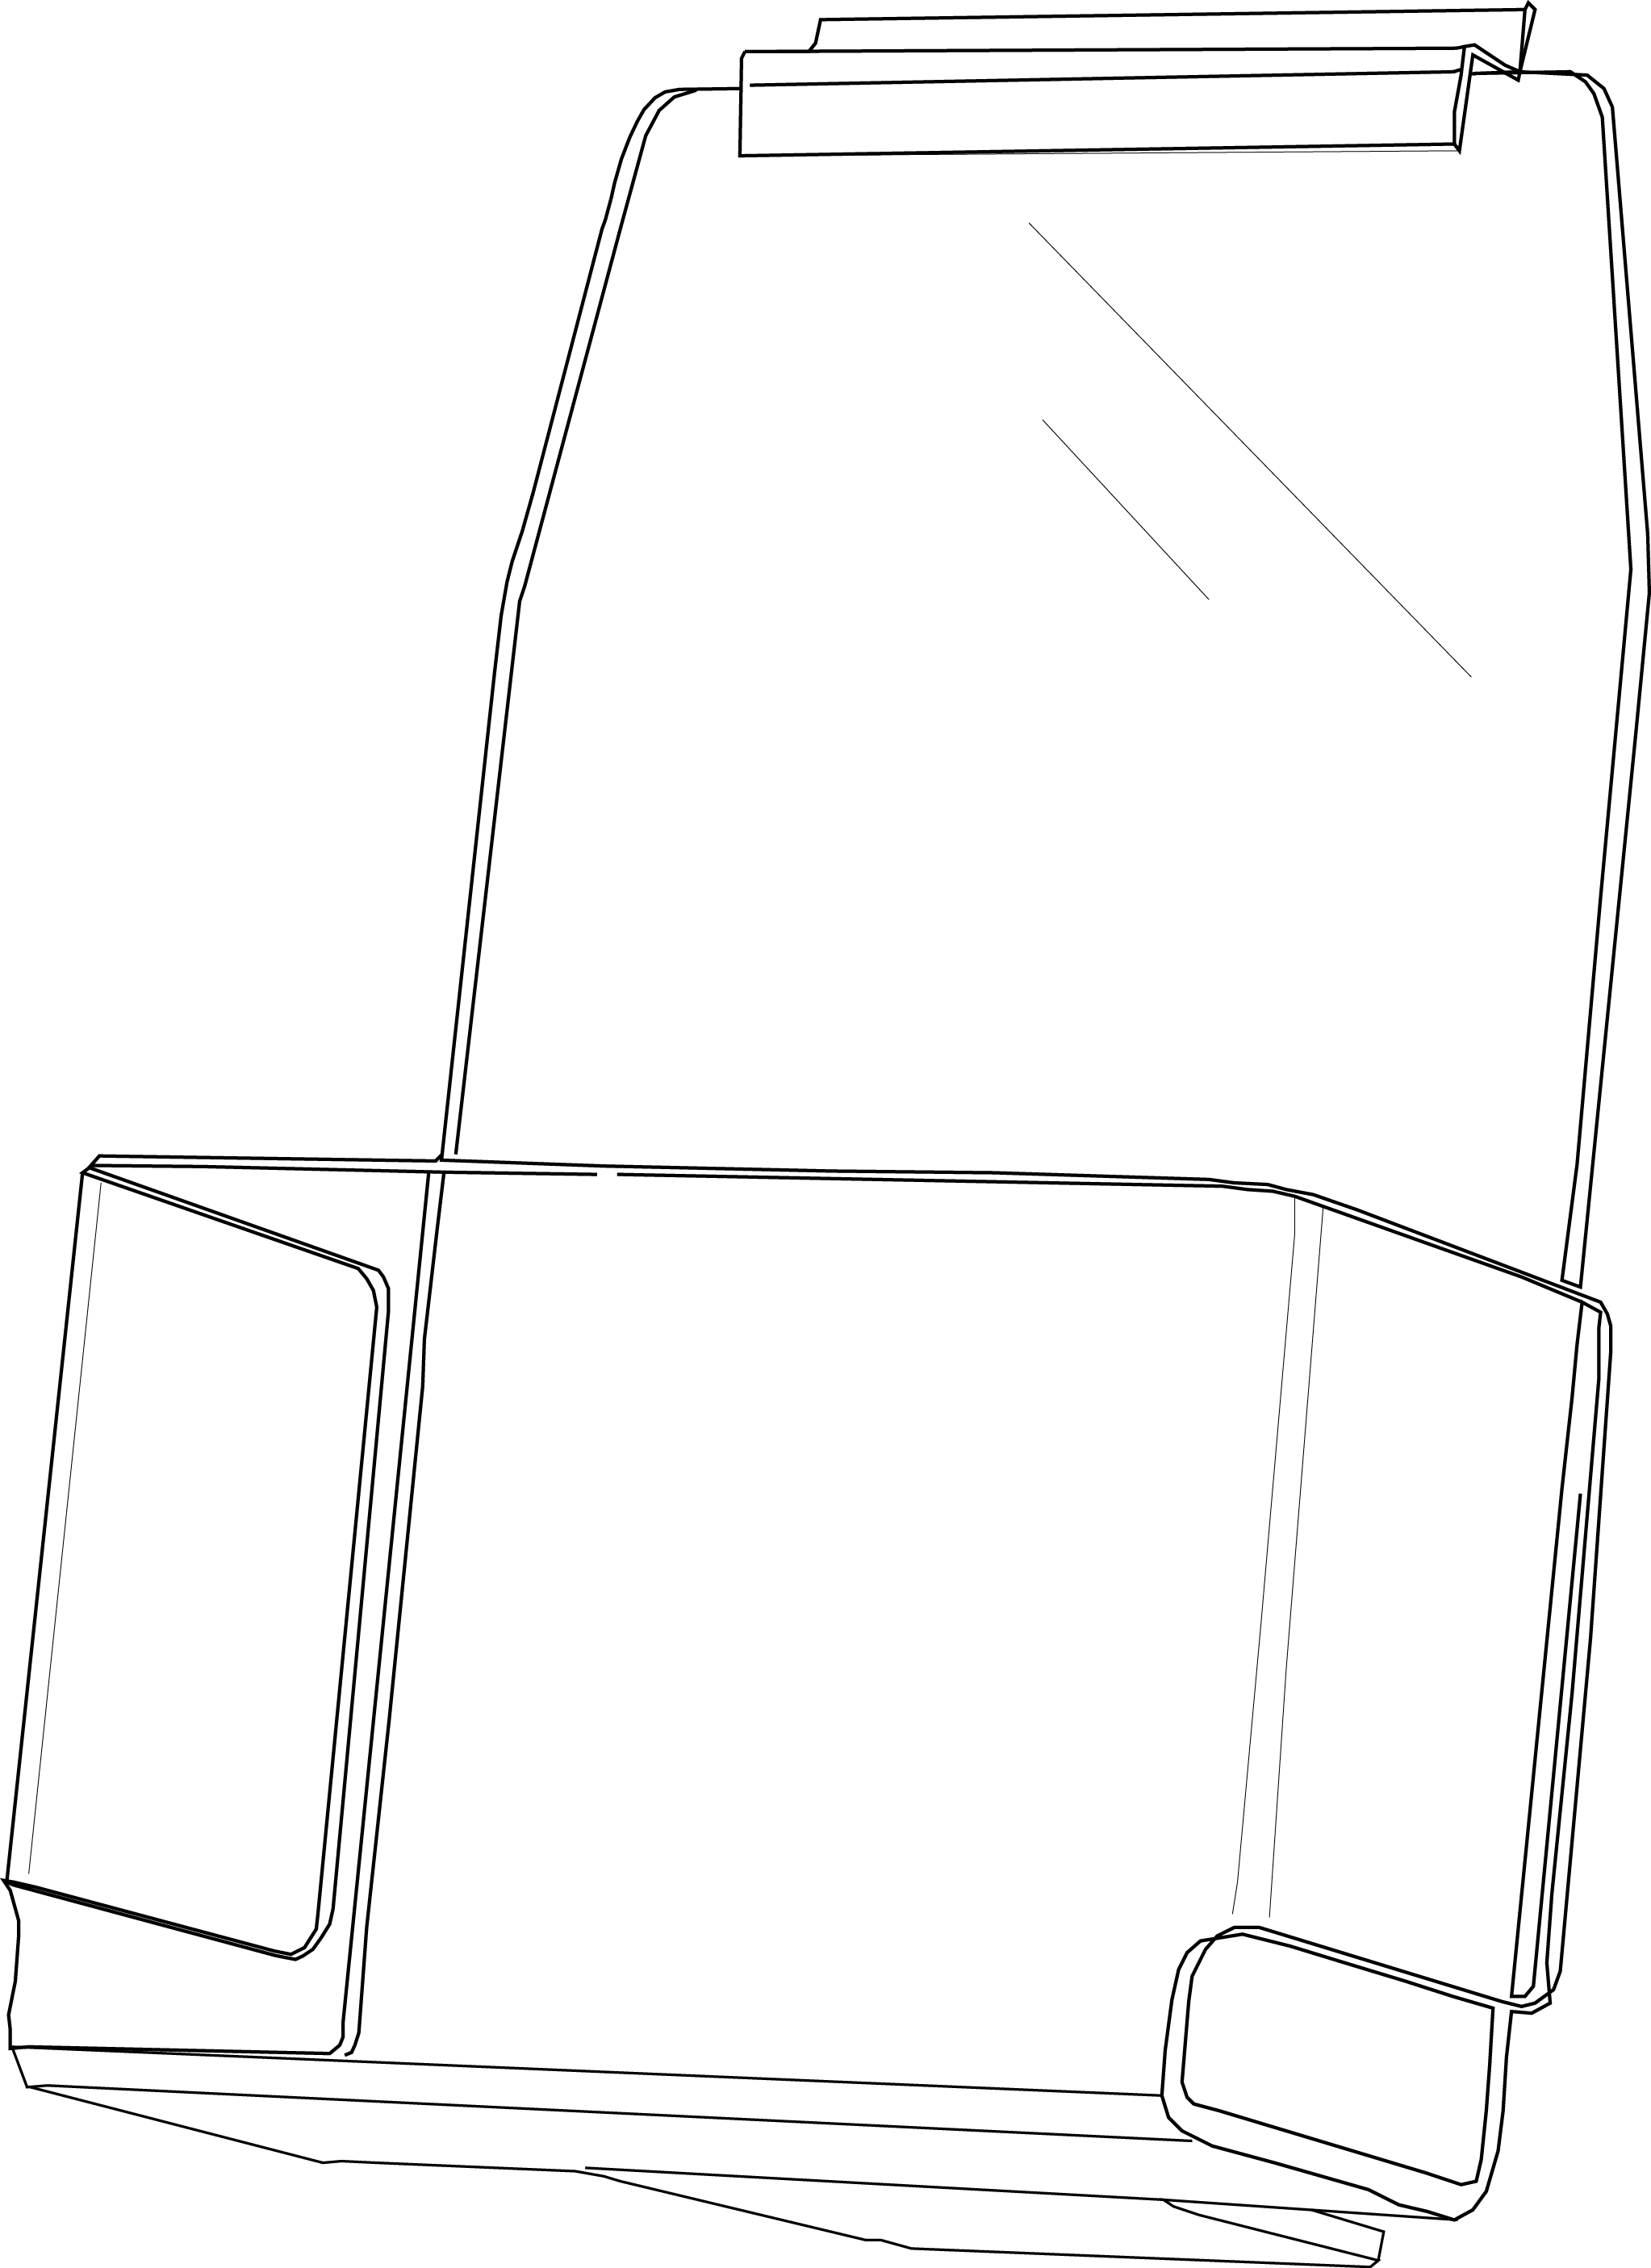 9460-line-drawing.jpg